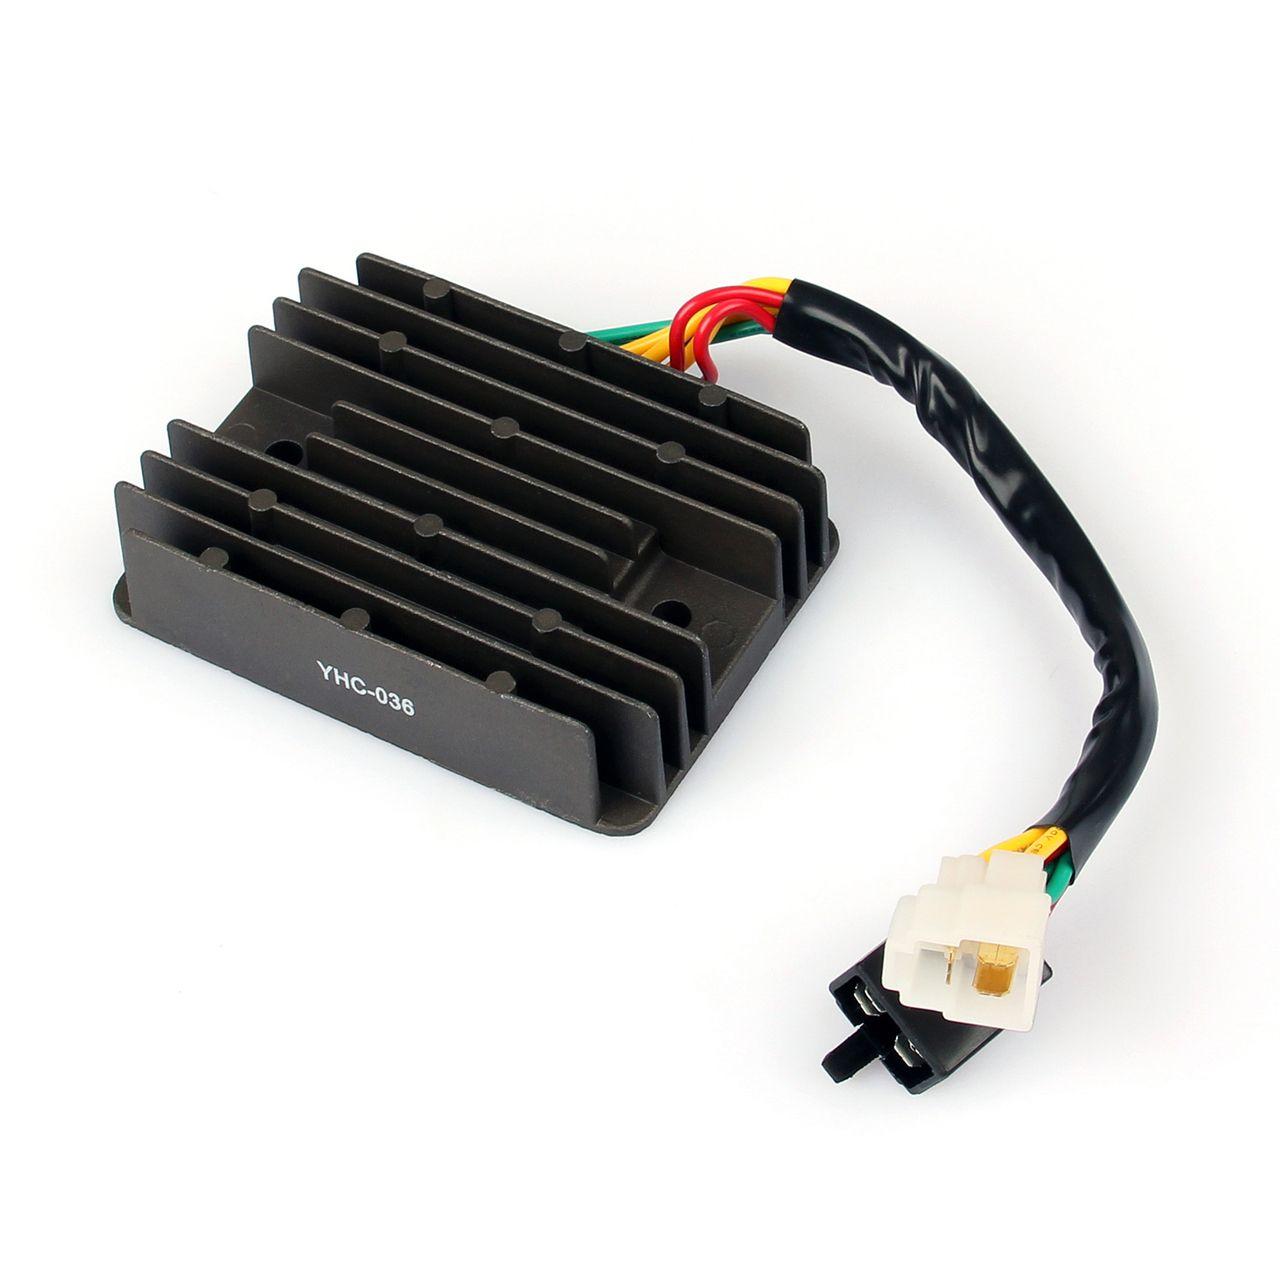 regulator voltage rectifier ducati desmosedici 1000 rr. Black Bedroom Furniture Sets. Home Design Ideas